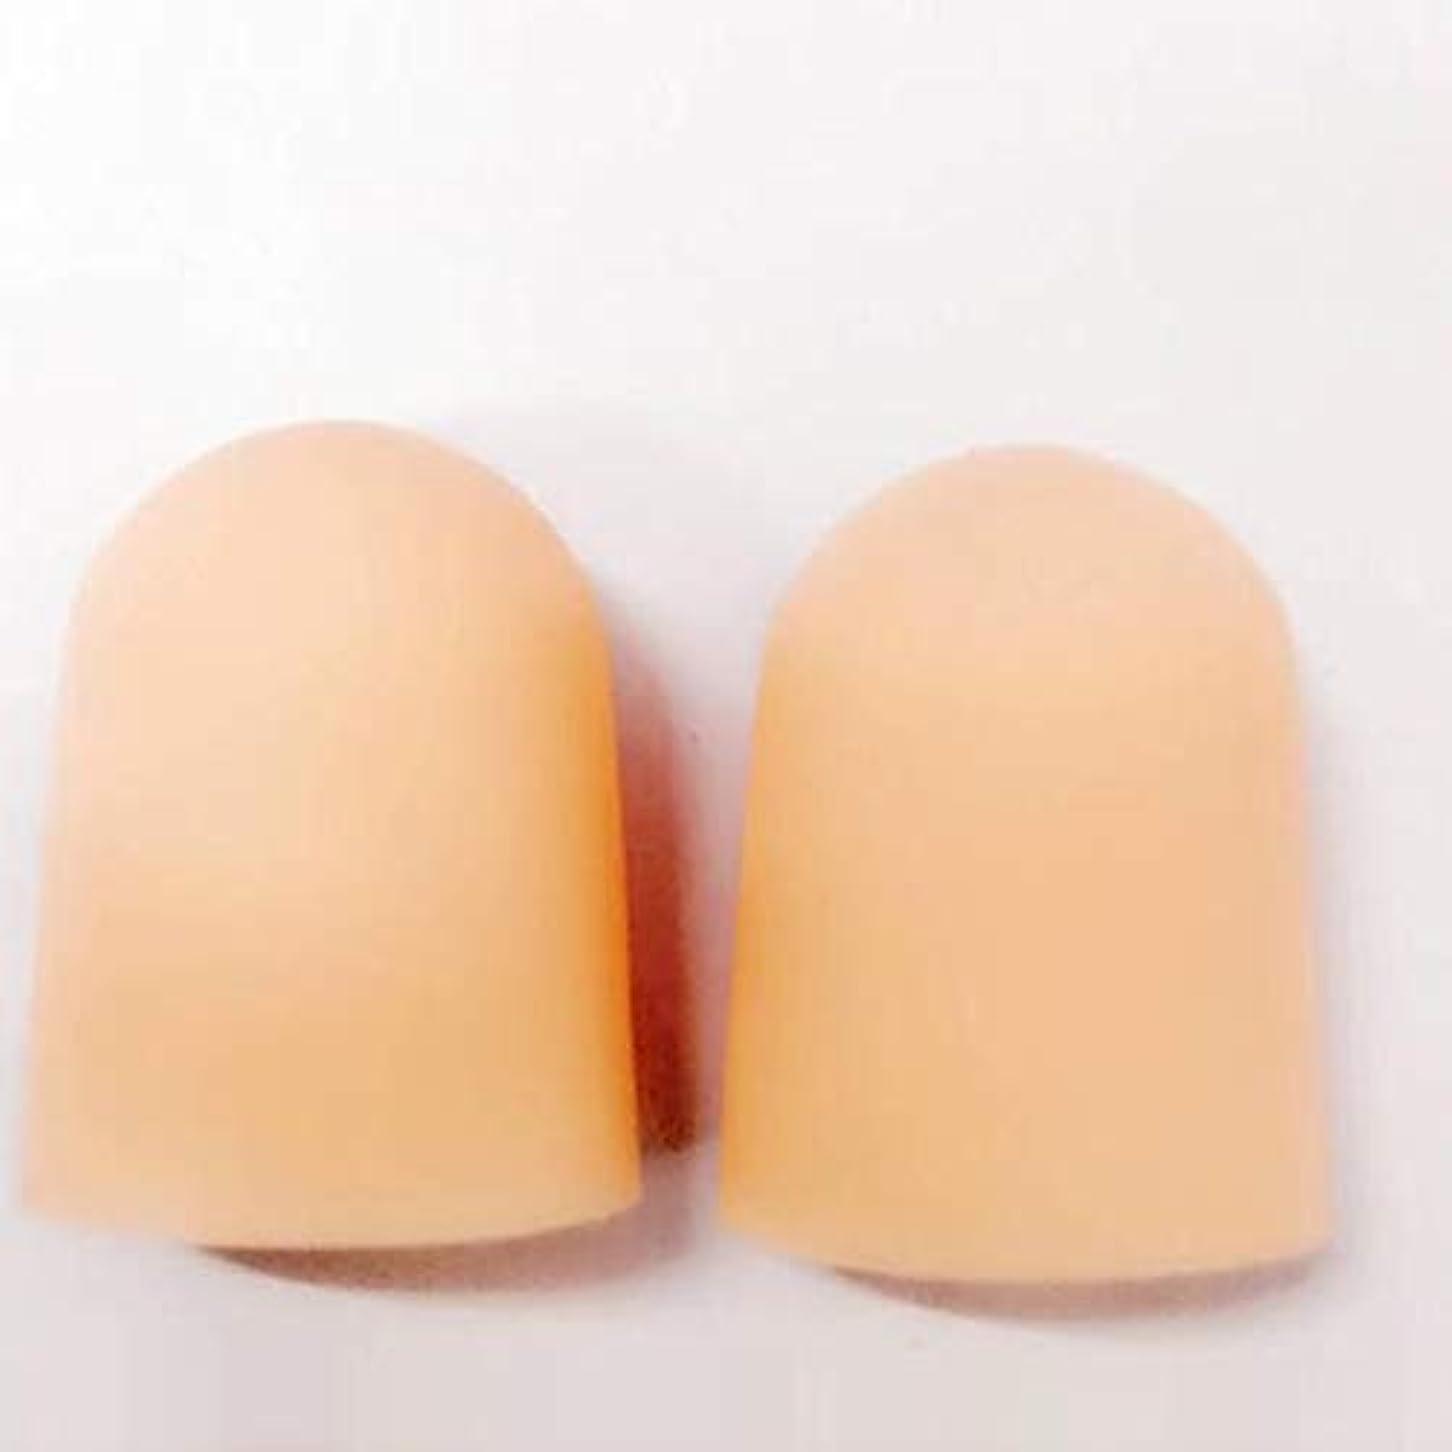 ACHICOO 1ペア外反母趾足指セパレーターペディキュアツール骨 足パッド white